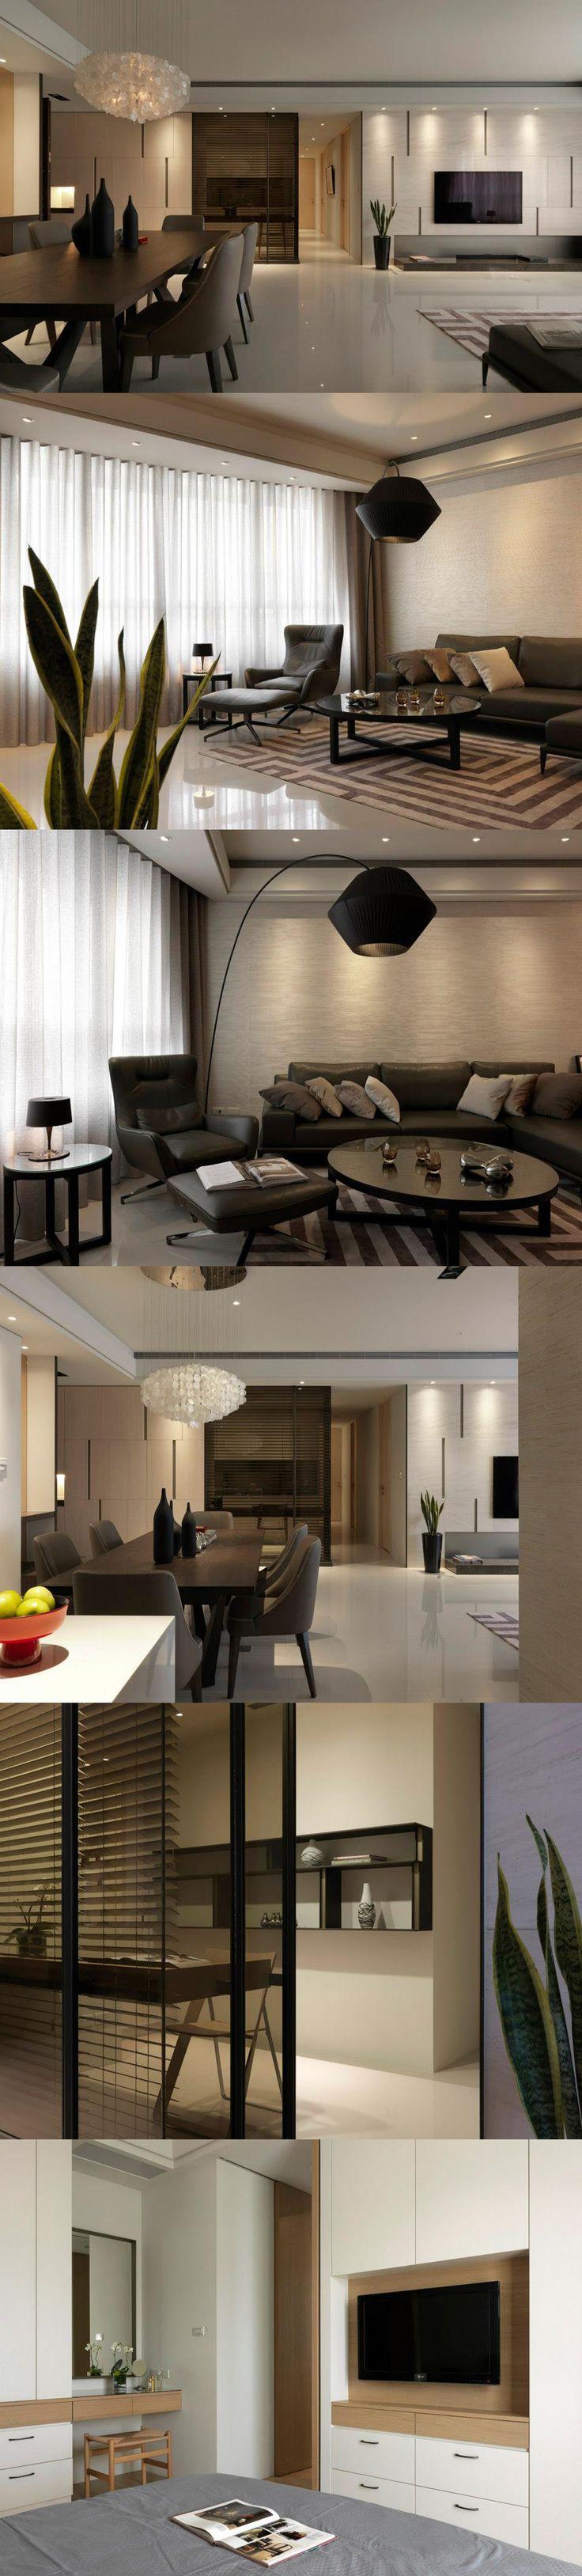 plafond suspendu faux plafond cuisine pinterest photos. Black Bedroom Furniture Sets. Home Design Ideas